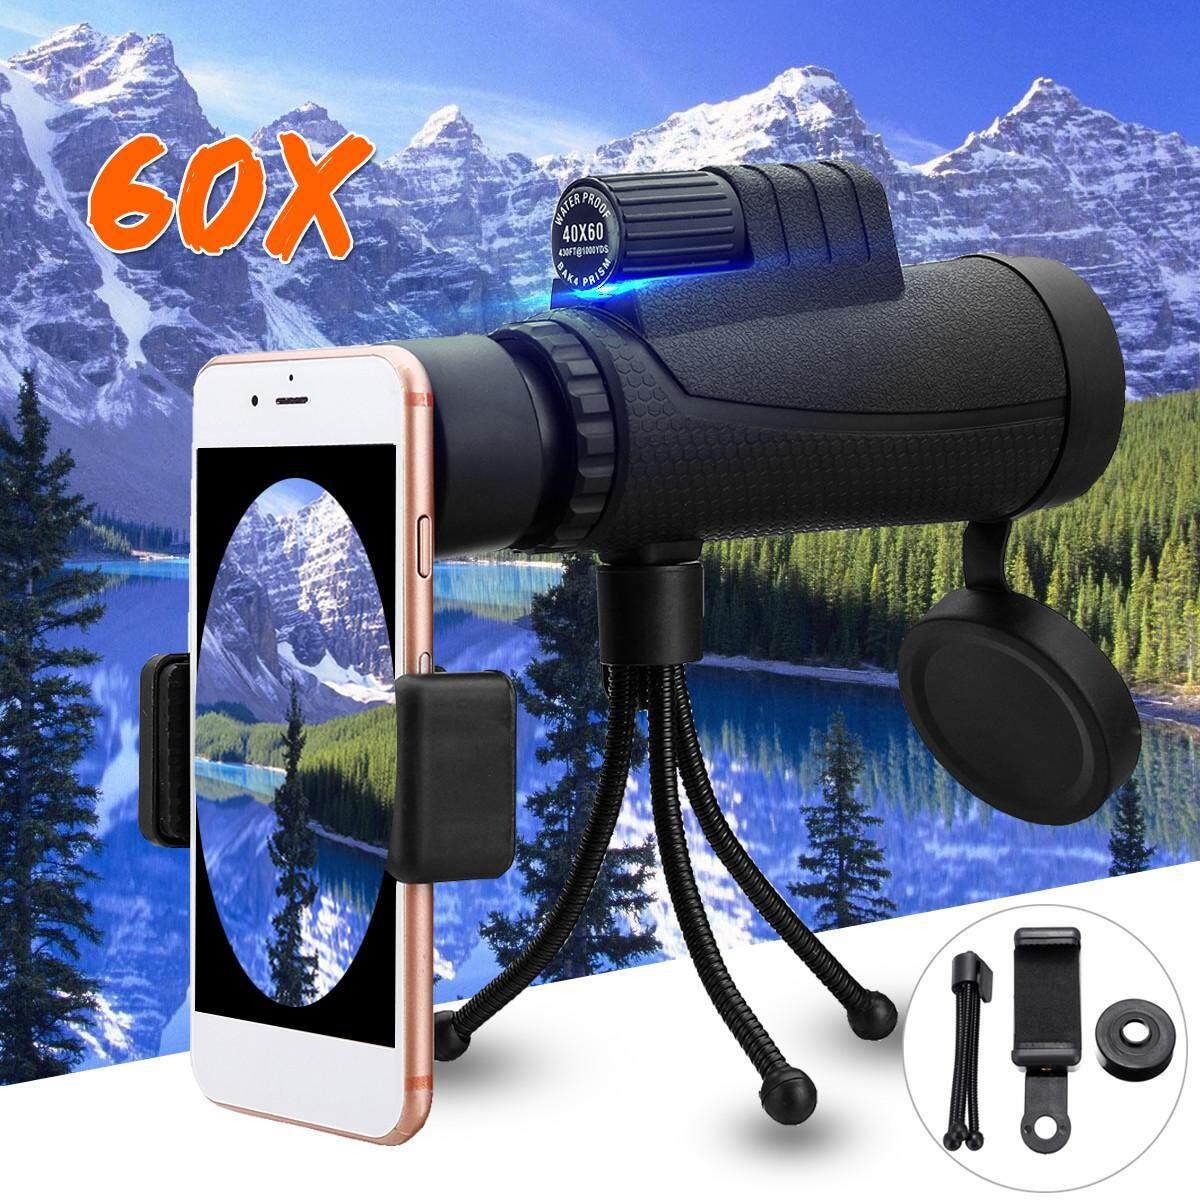 40x60 Telephoto Monocular Camera Lens + Phone Holder + Tripod For Mobile Phone